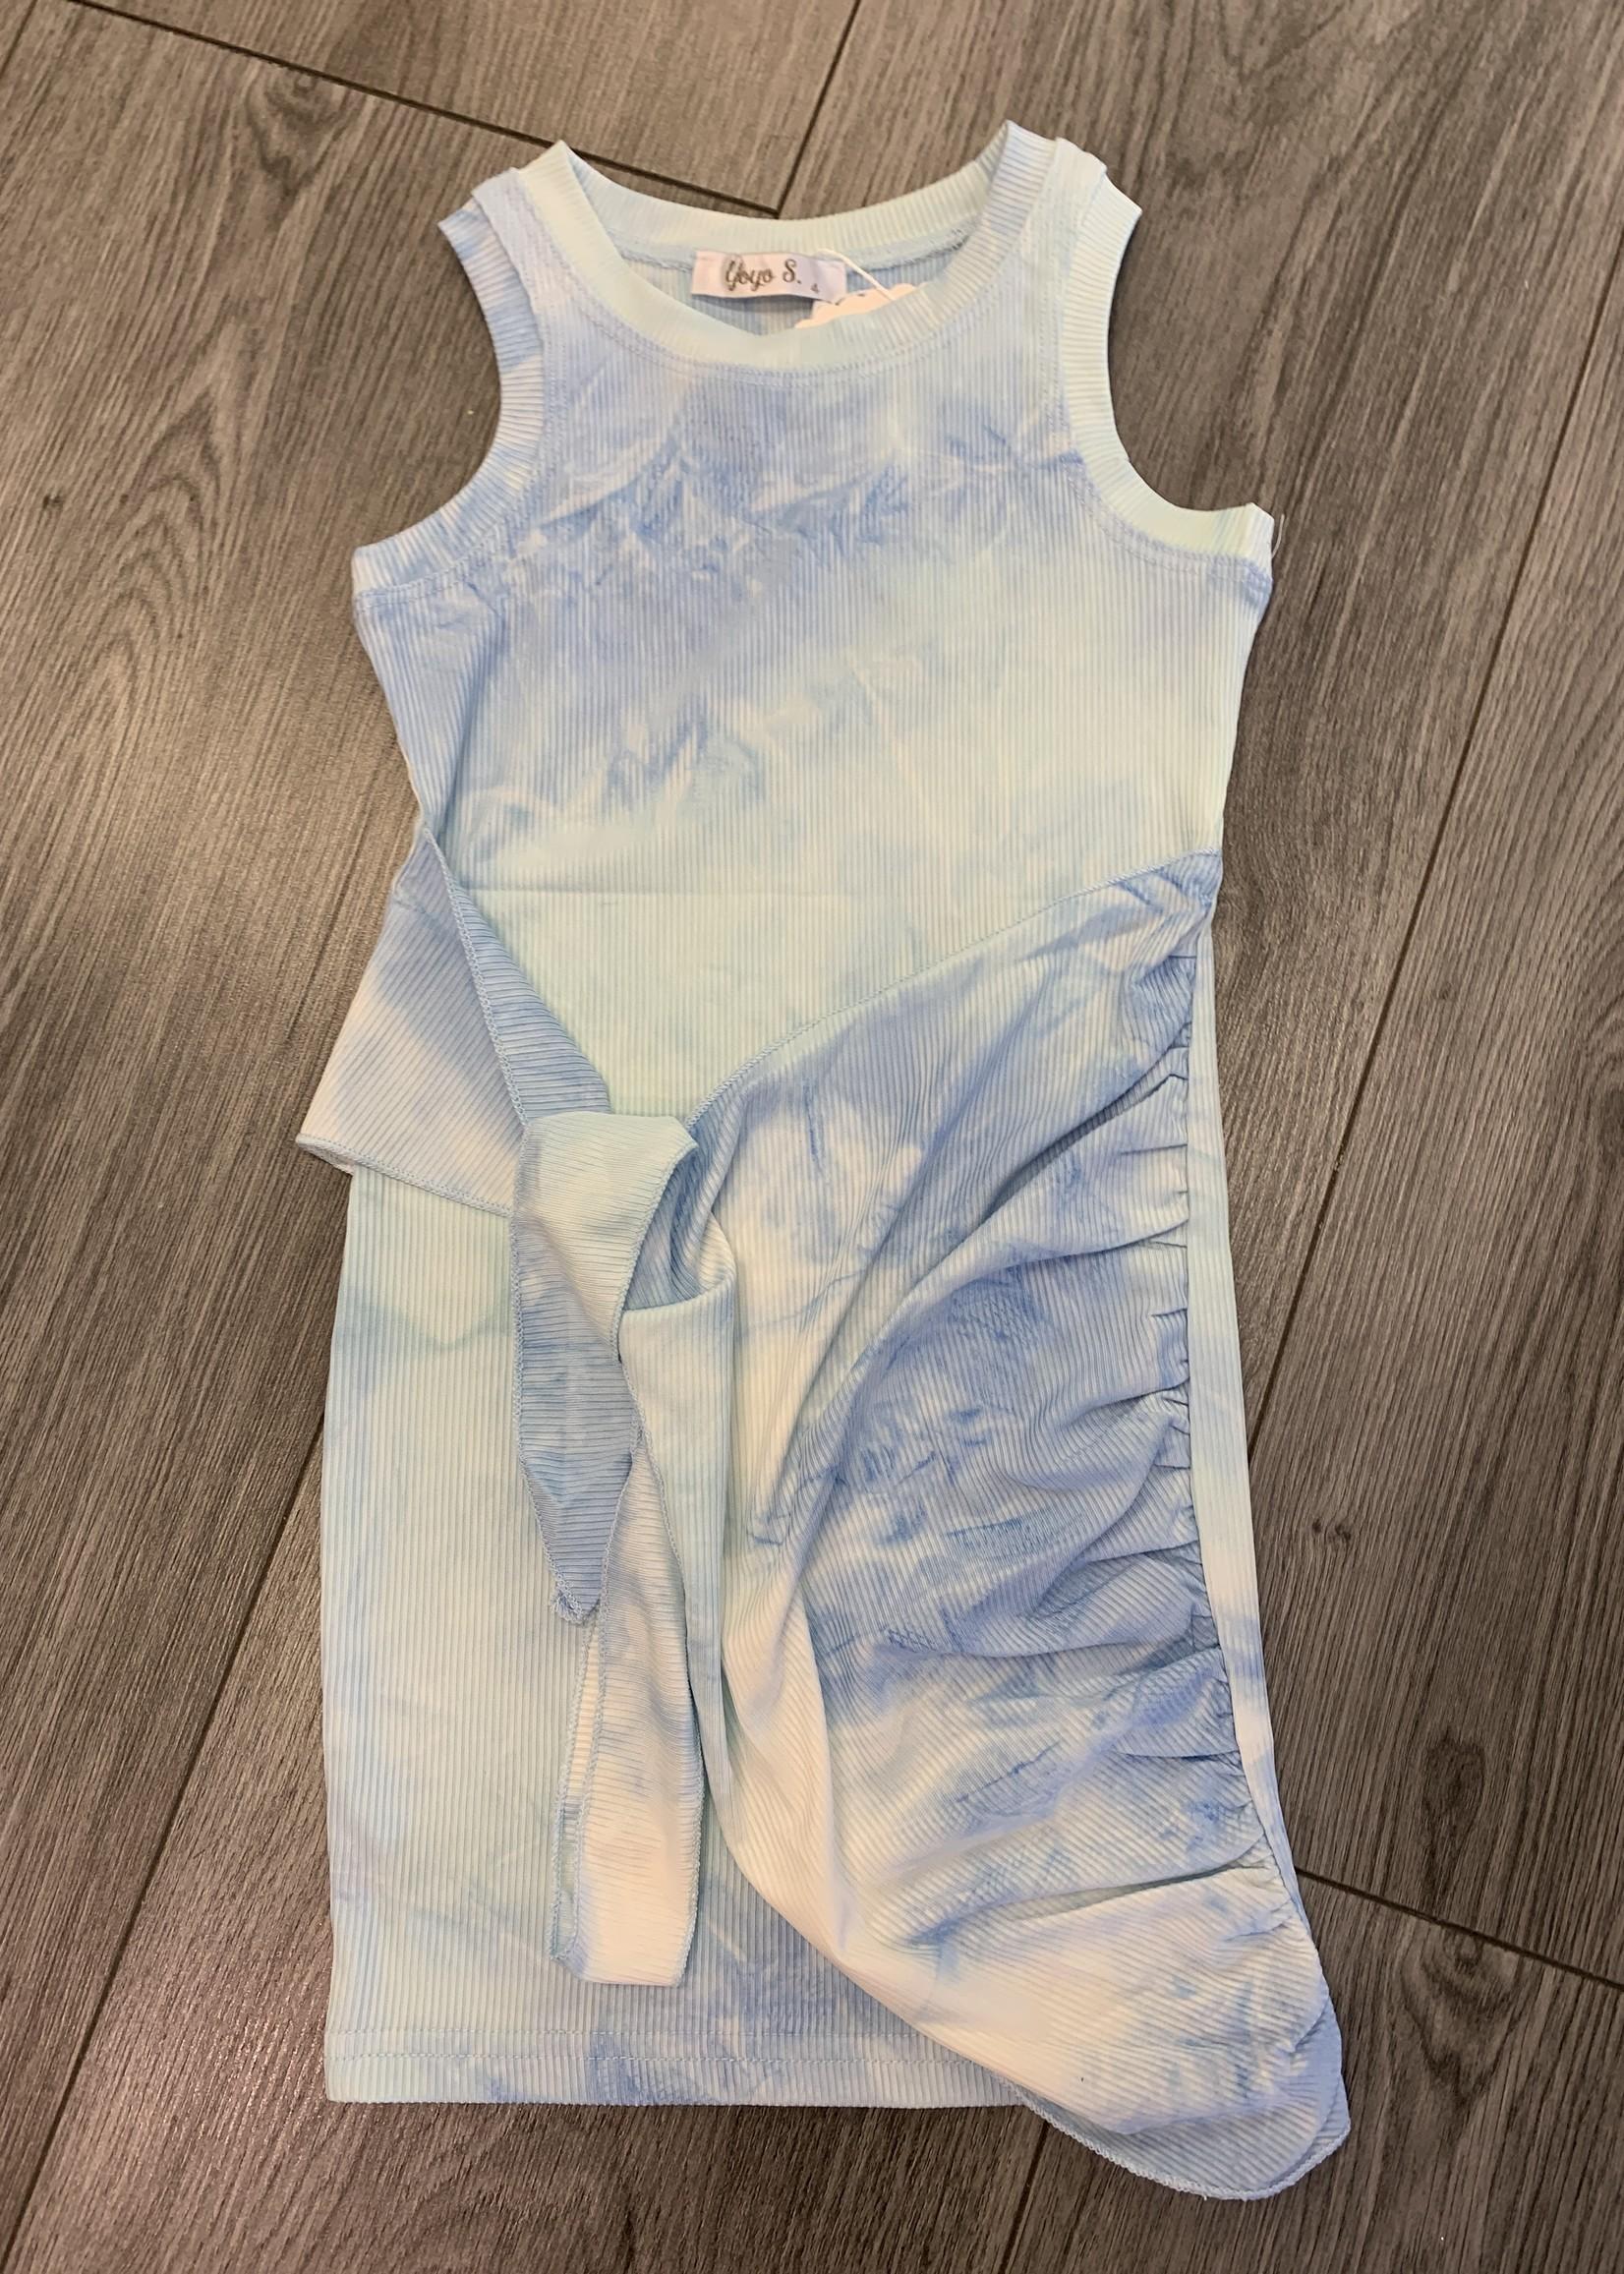 Divanis Divanis tiedye pastel dress blue